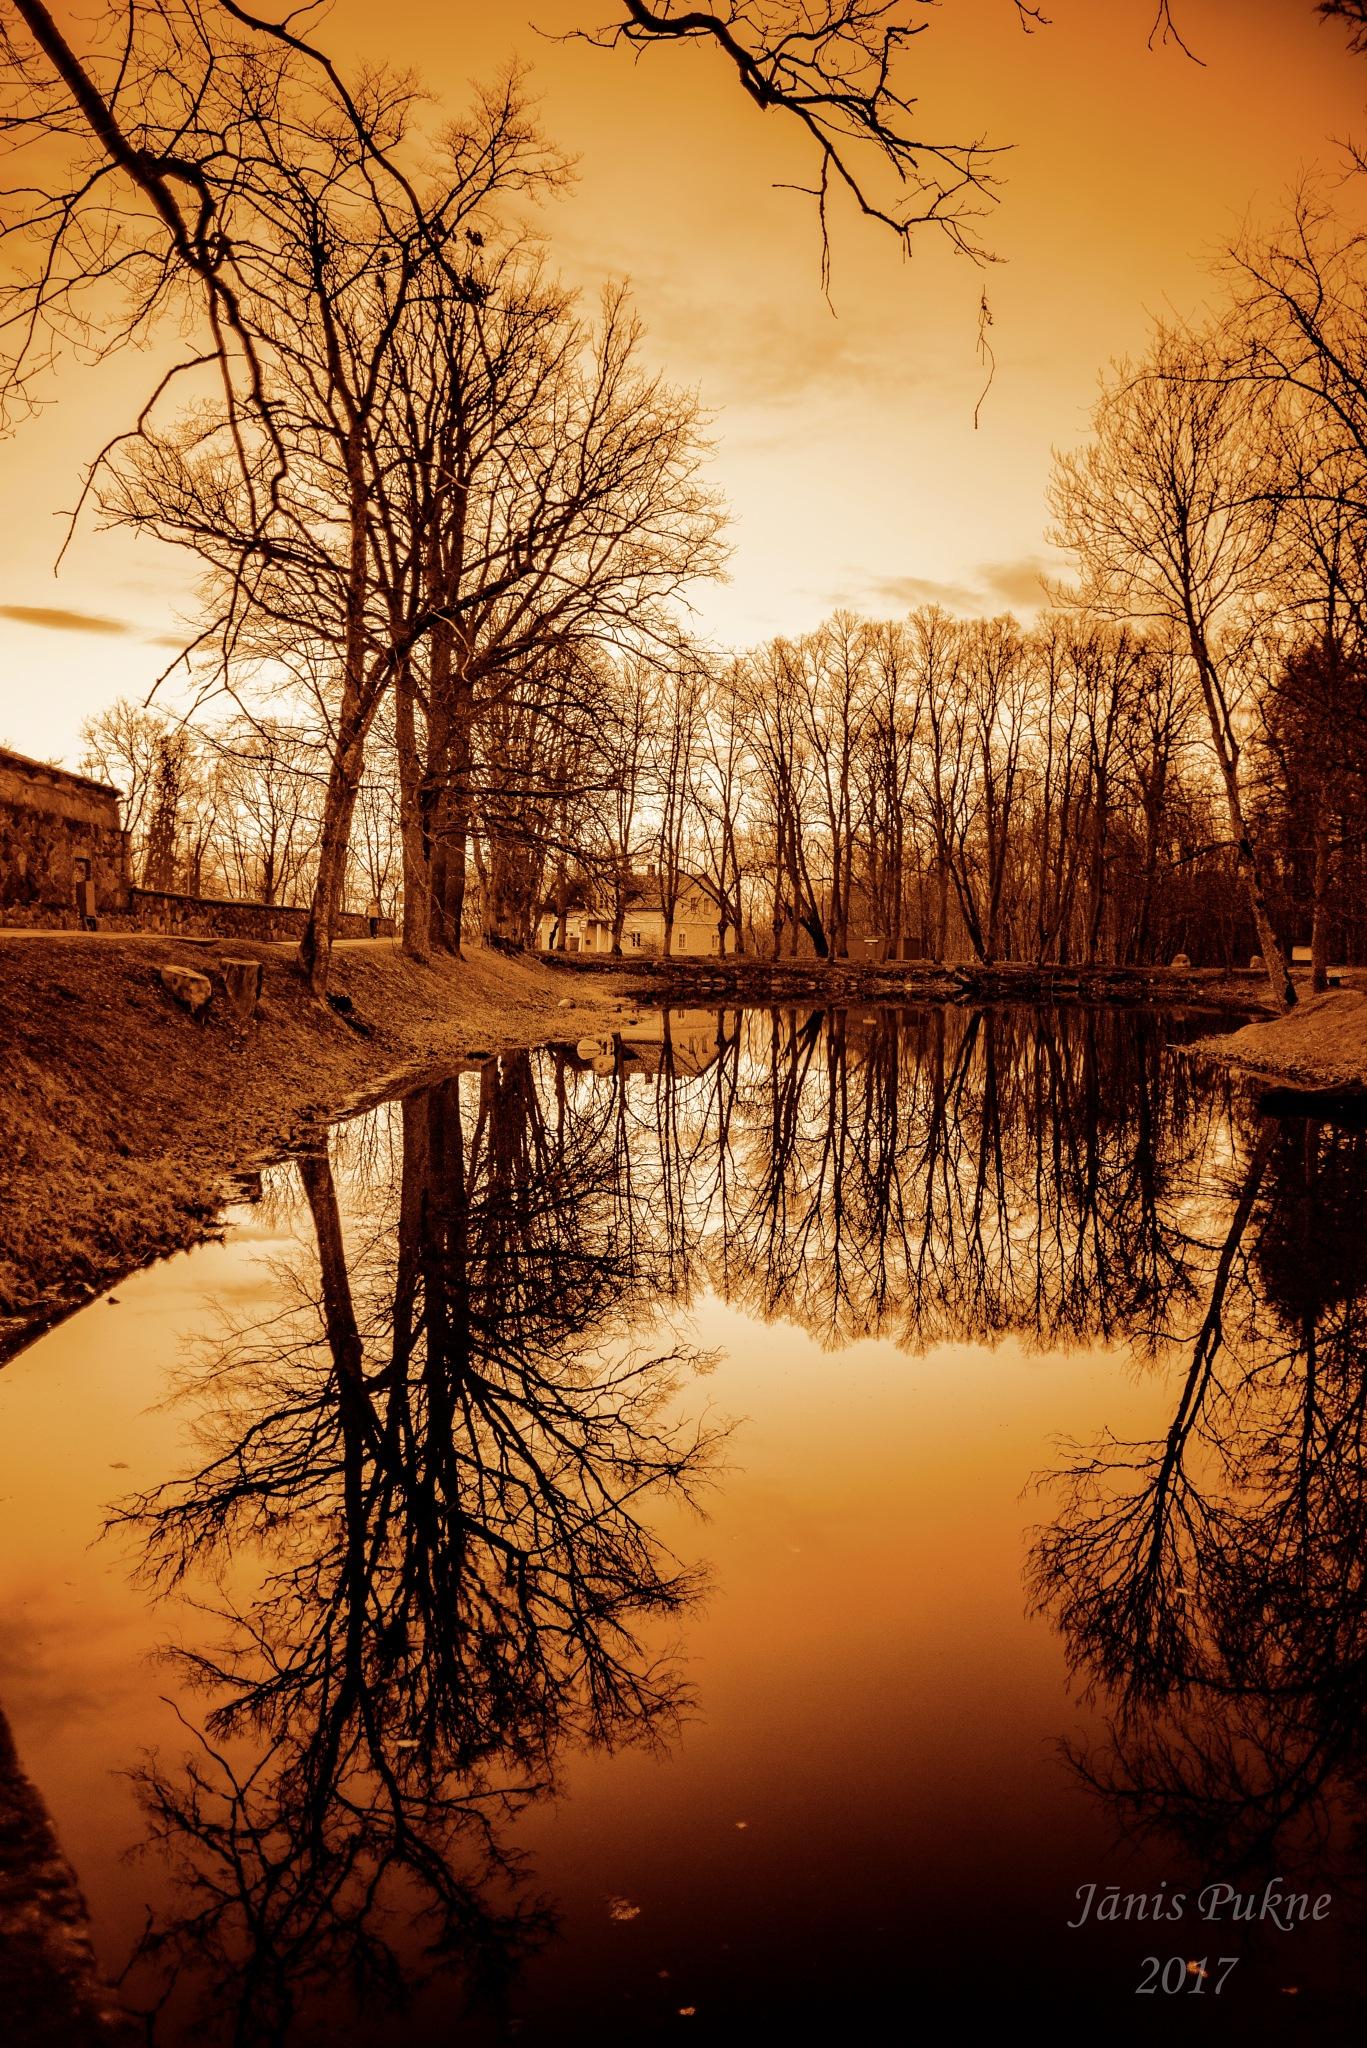 Twilight. by Janis Pukne